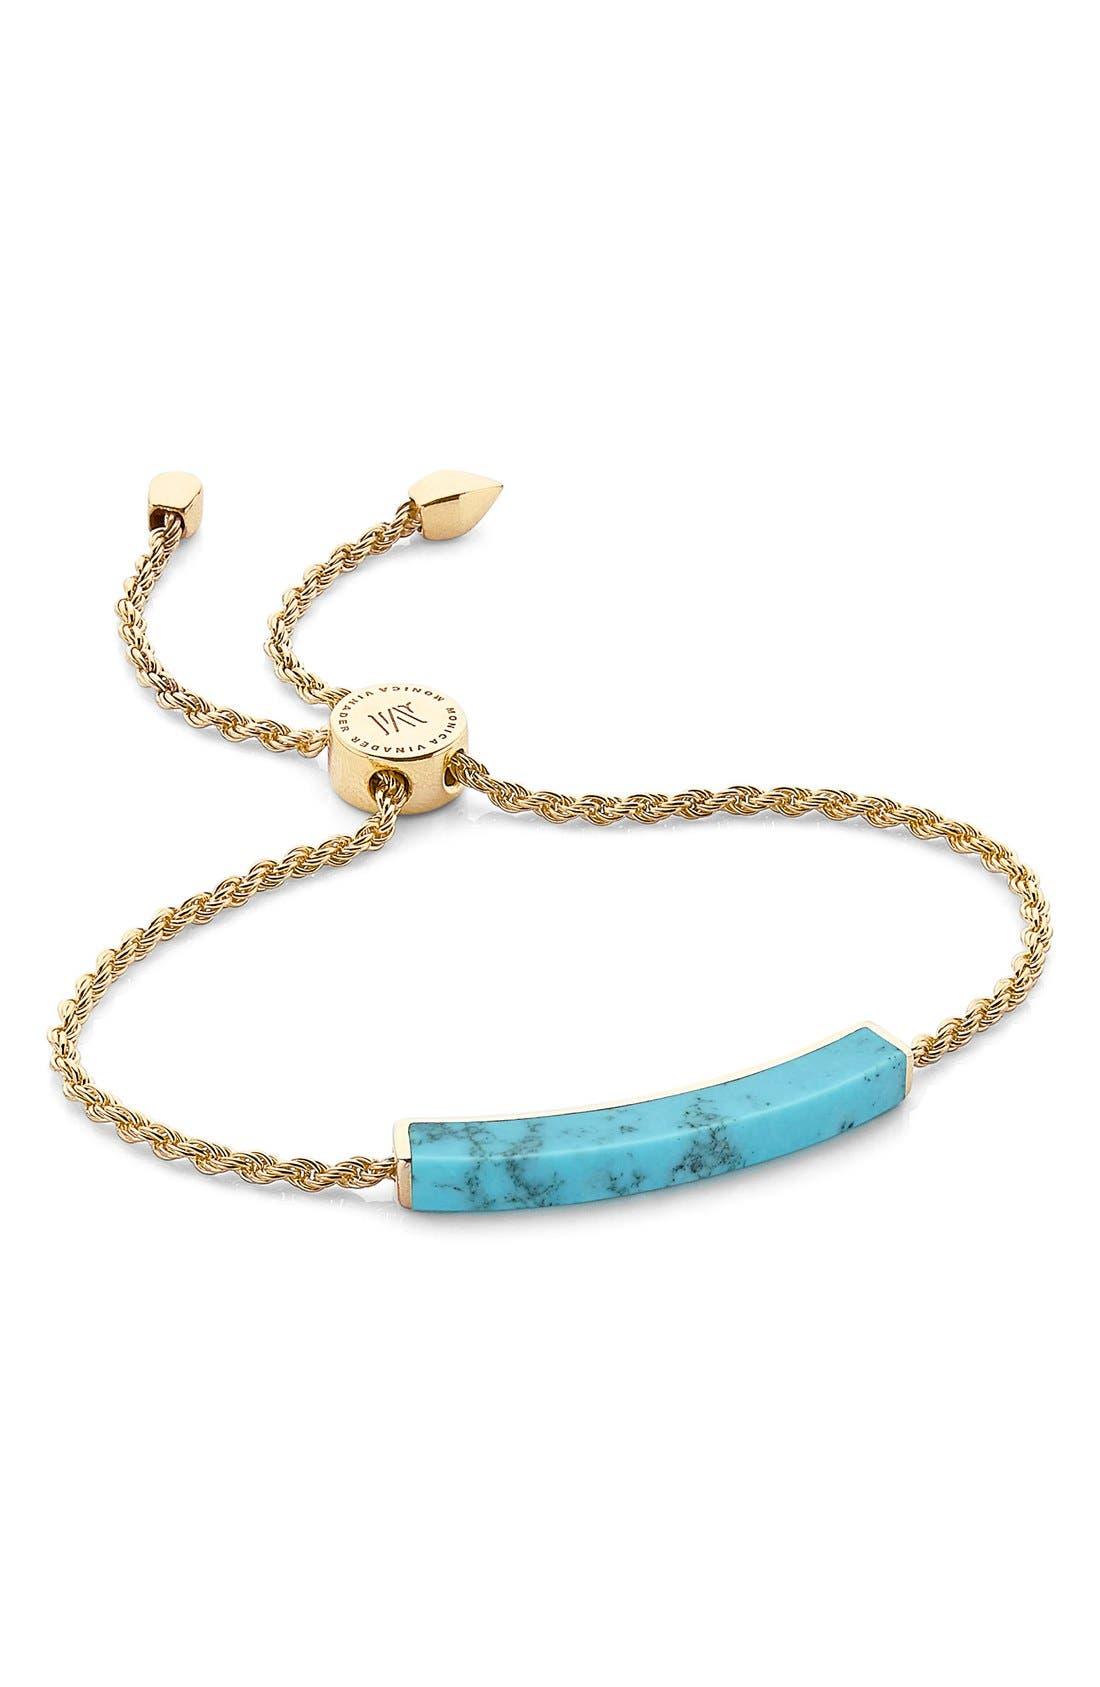 Linear Semiprecious Stone Bracelet,                             Main thumbnail 1, color,                             Gold/ Turquoise